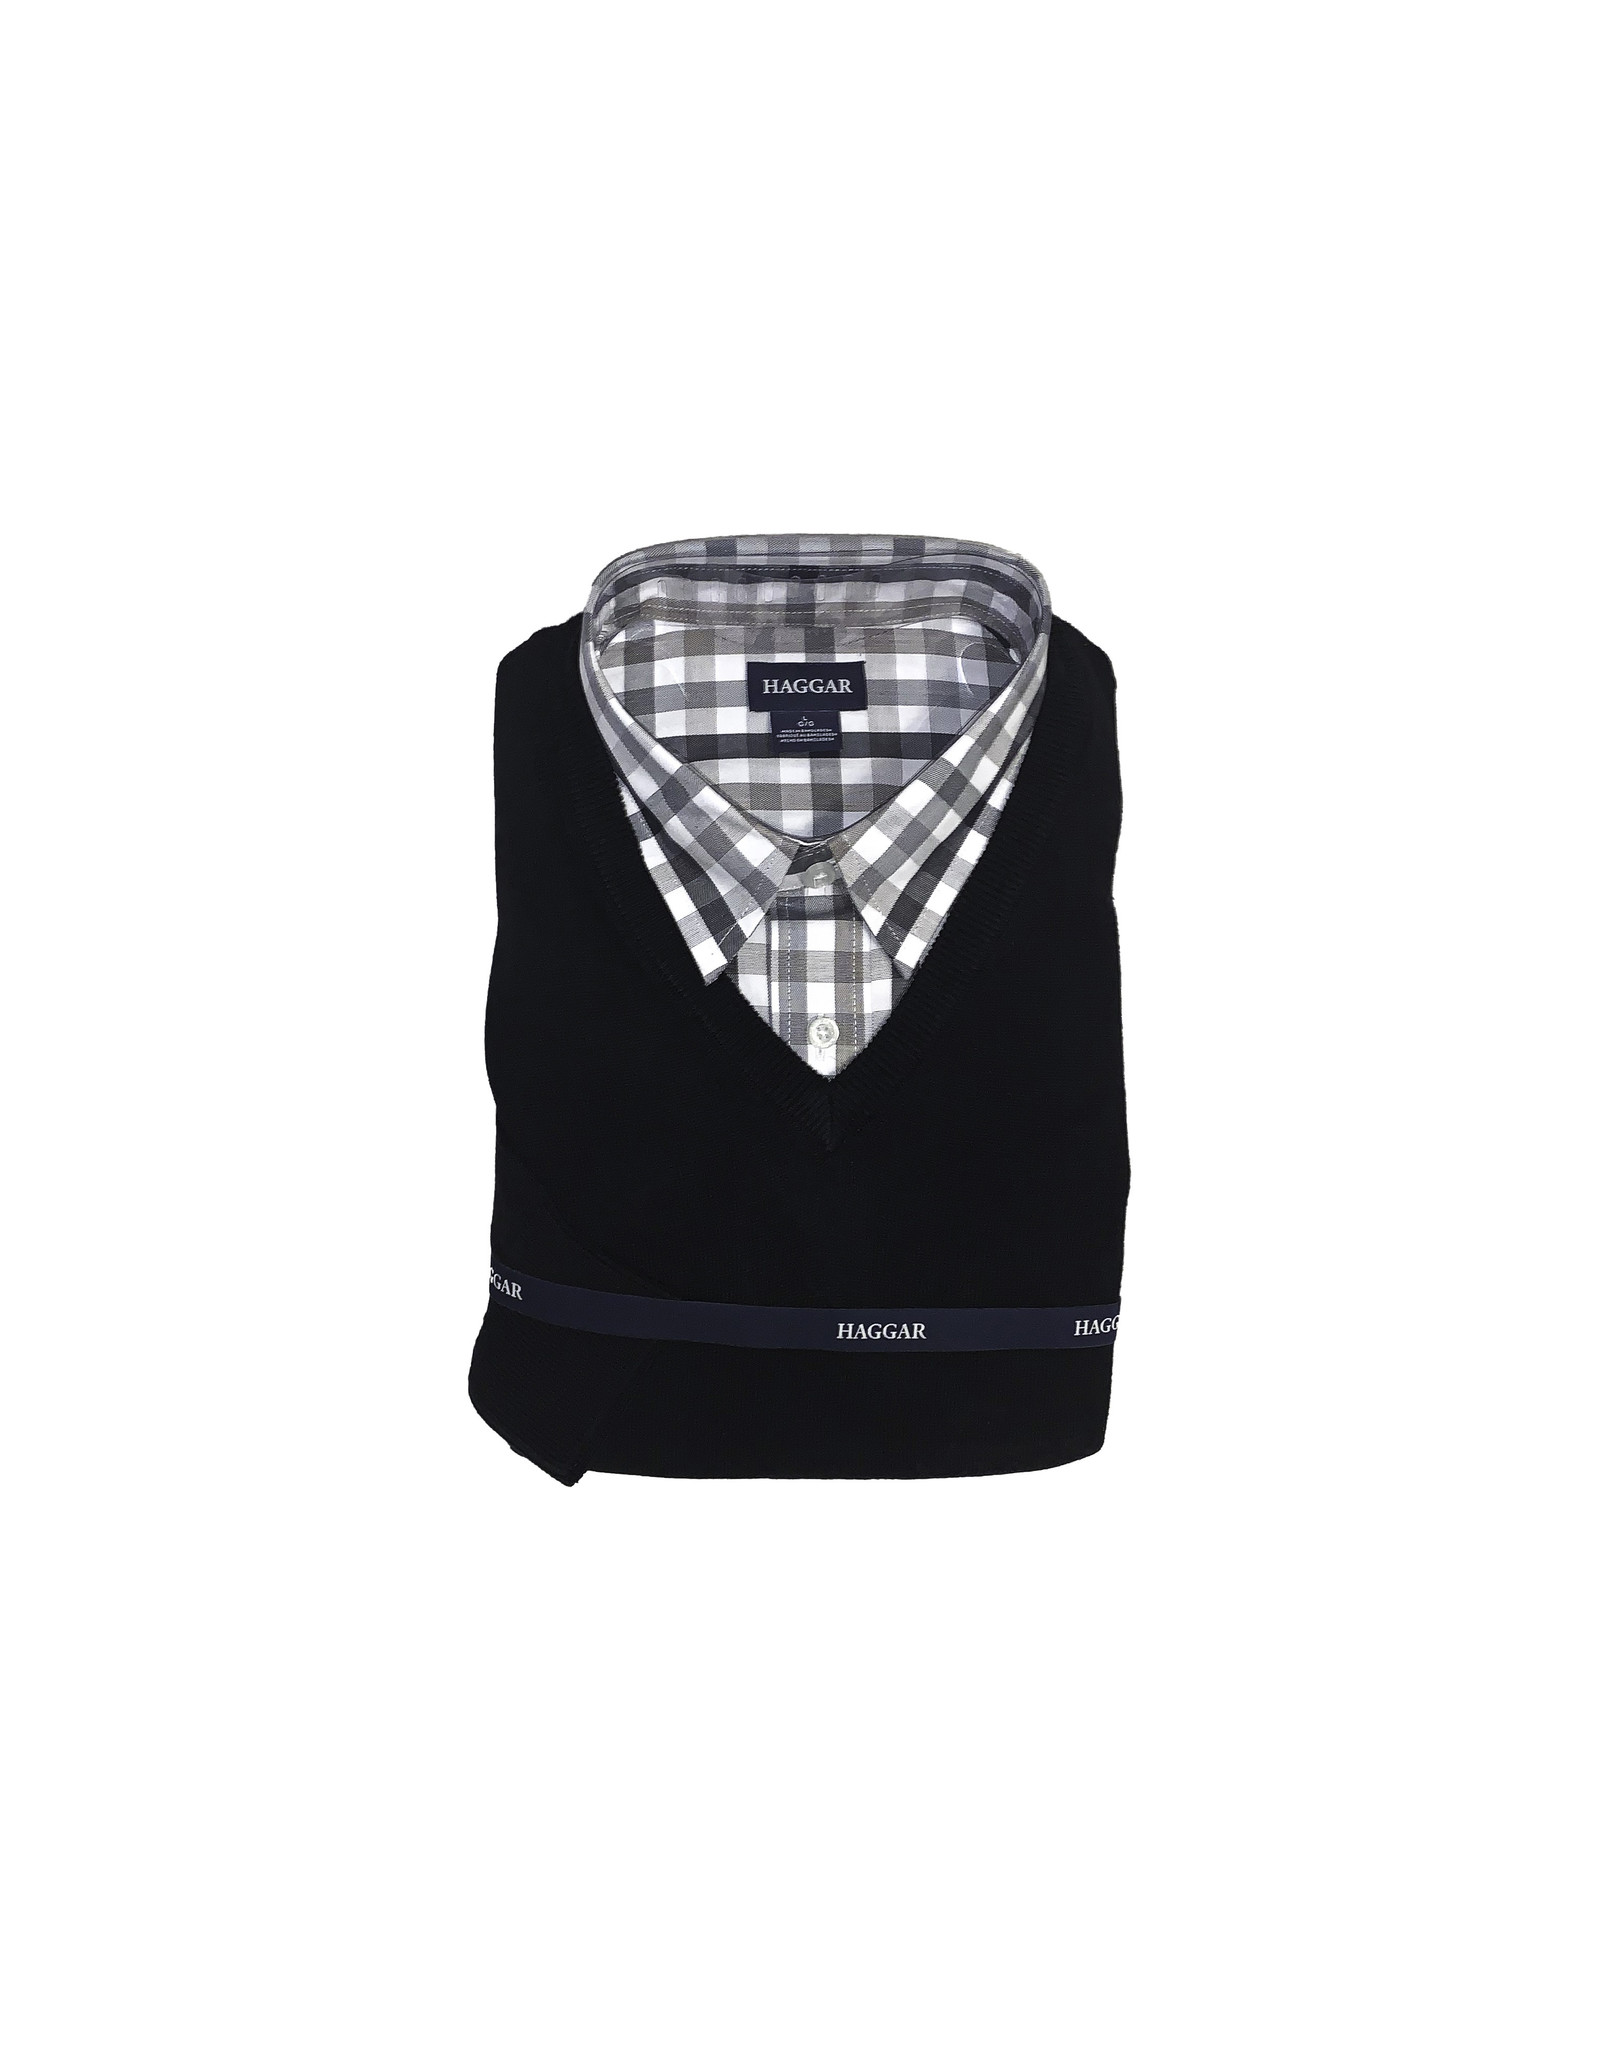 Haggar Haggar 2-Piece Sweater & Shirt